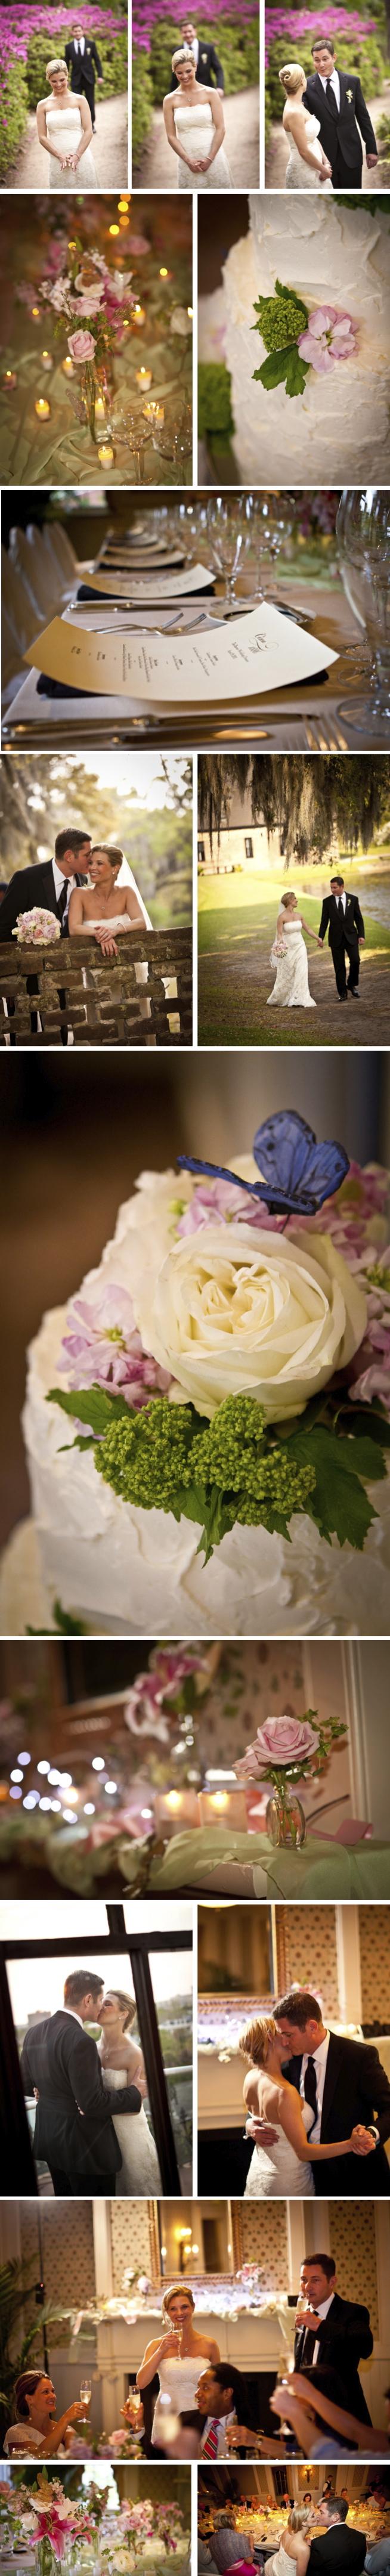 wedding blogs | wedding pictures